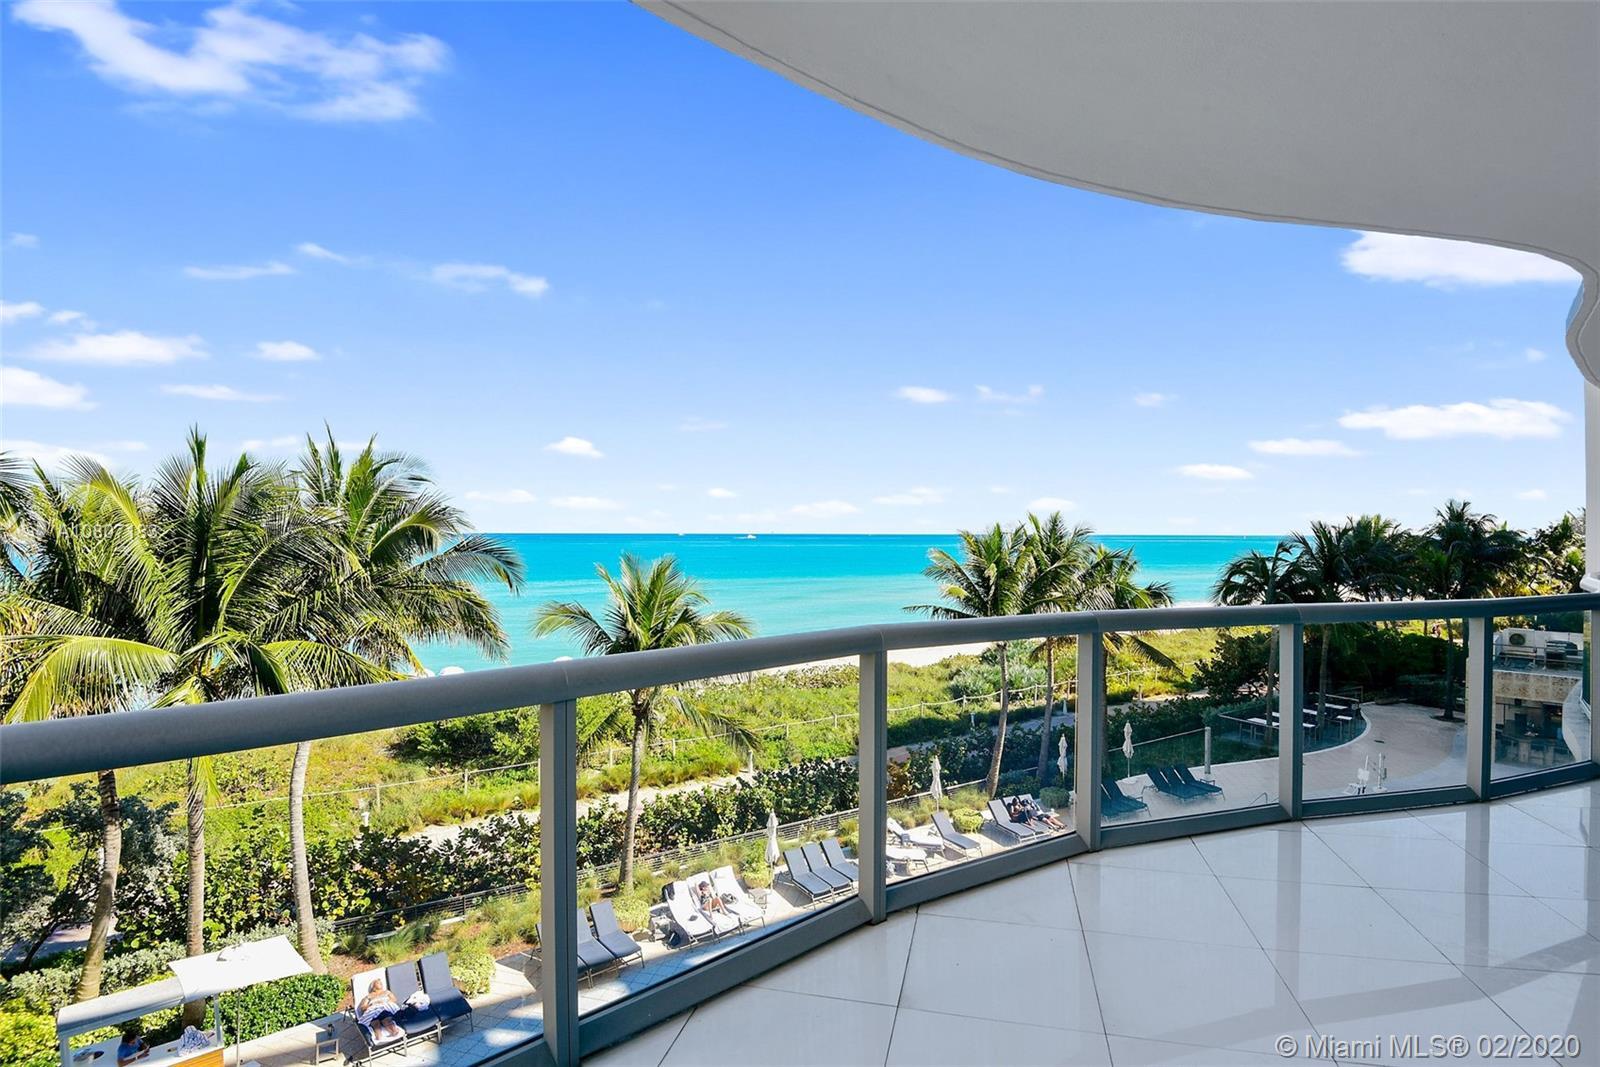 6799 Collins Ave, 304 - Miami Beach, Florida